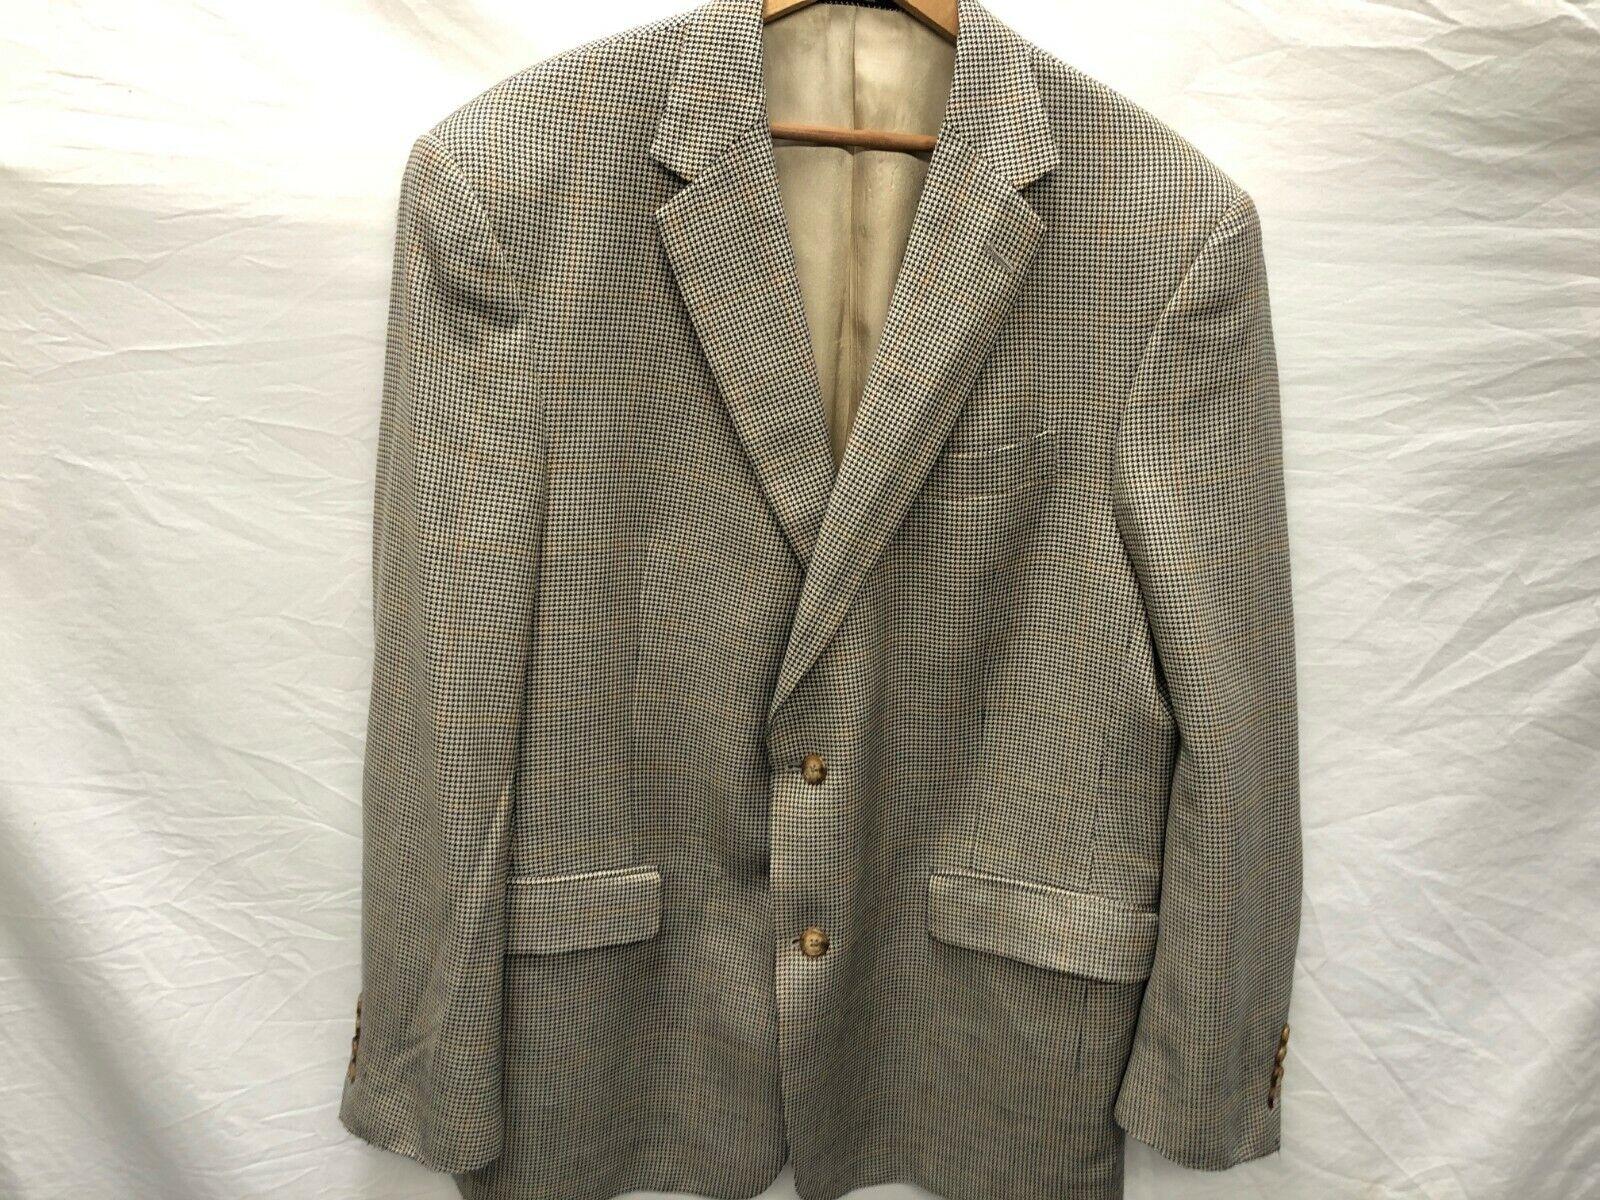 Hart Schaffner Marx For Nordstrom Mens 44R Tan Herringbone Sports Coat 2 Btn